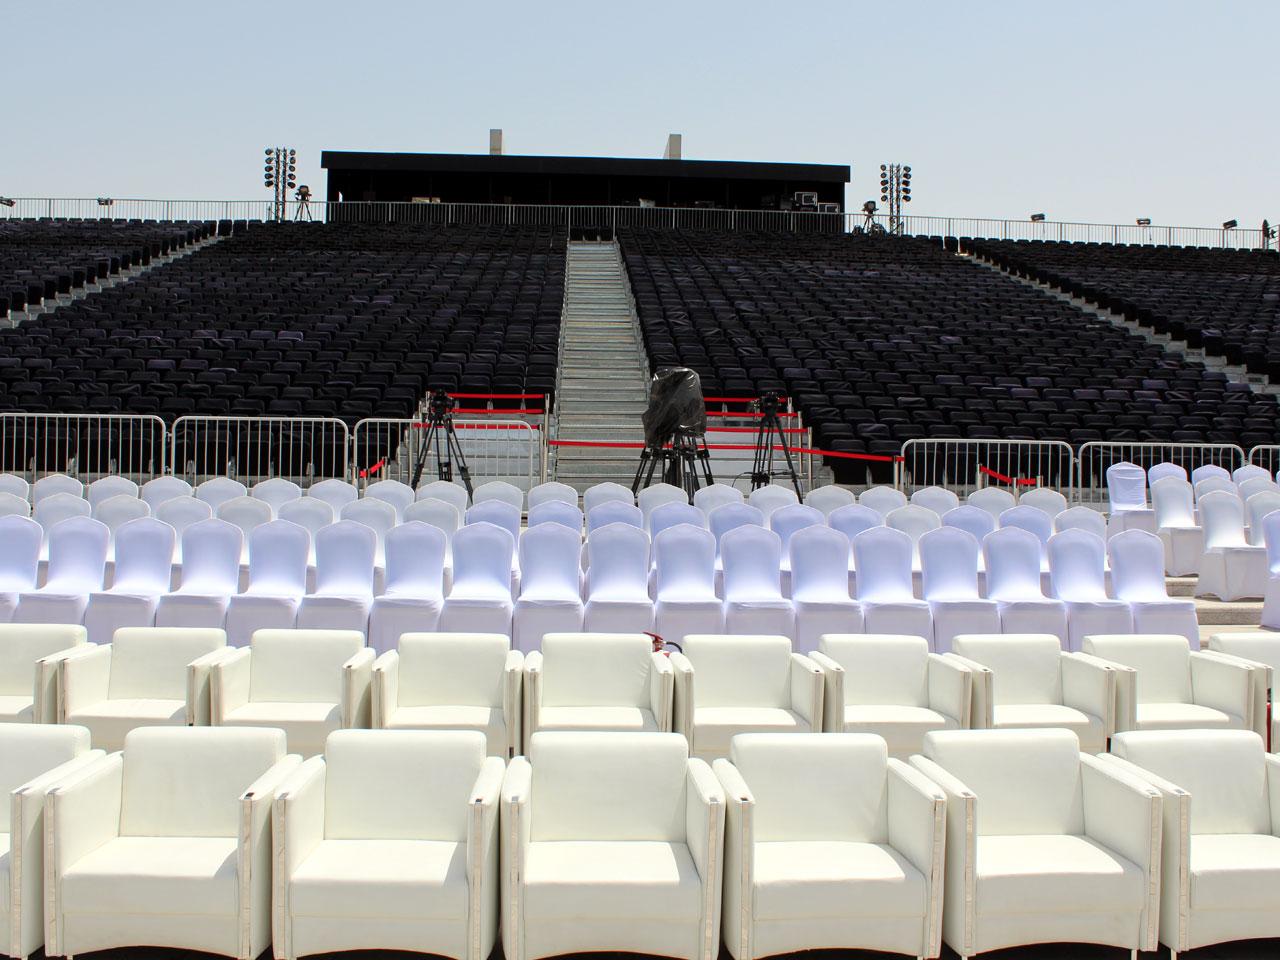 qatar-foundation-convocation-grandstands-2019-20